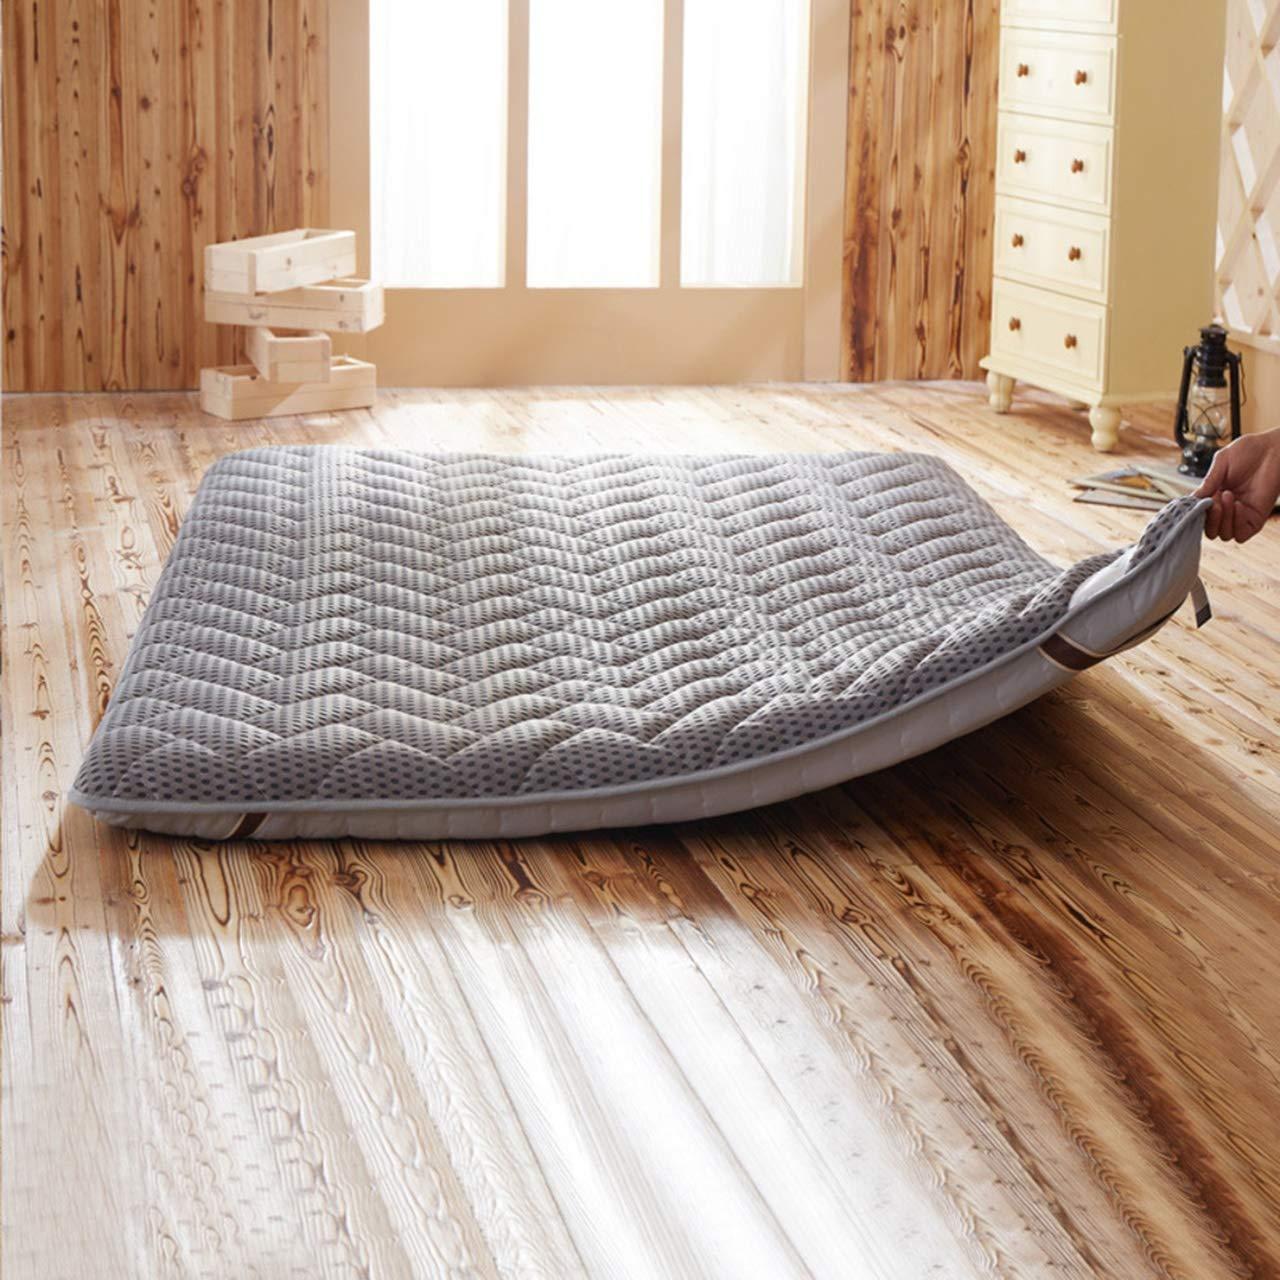 Wanggang Student Dorm Mattress Breathable Tatami Floor Mat Double Futon Mattress Topper Portable Sleeping Pad Non-Slip Foldable Cushion Mats (Color : B, Size : 90x190cm) by Wanggang